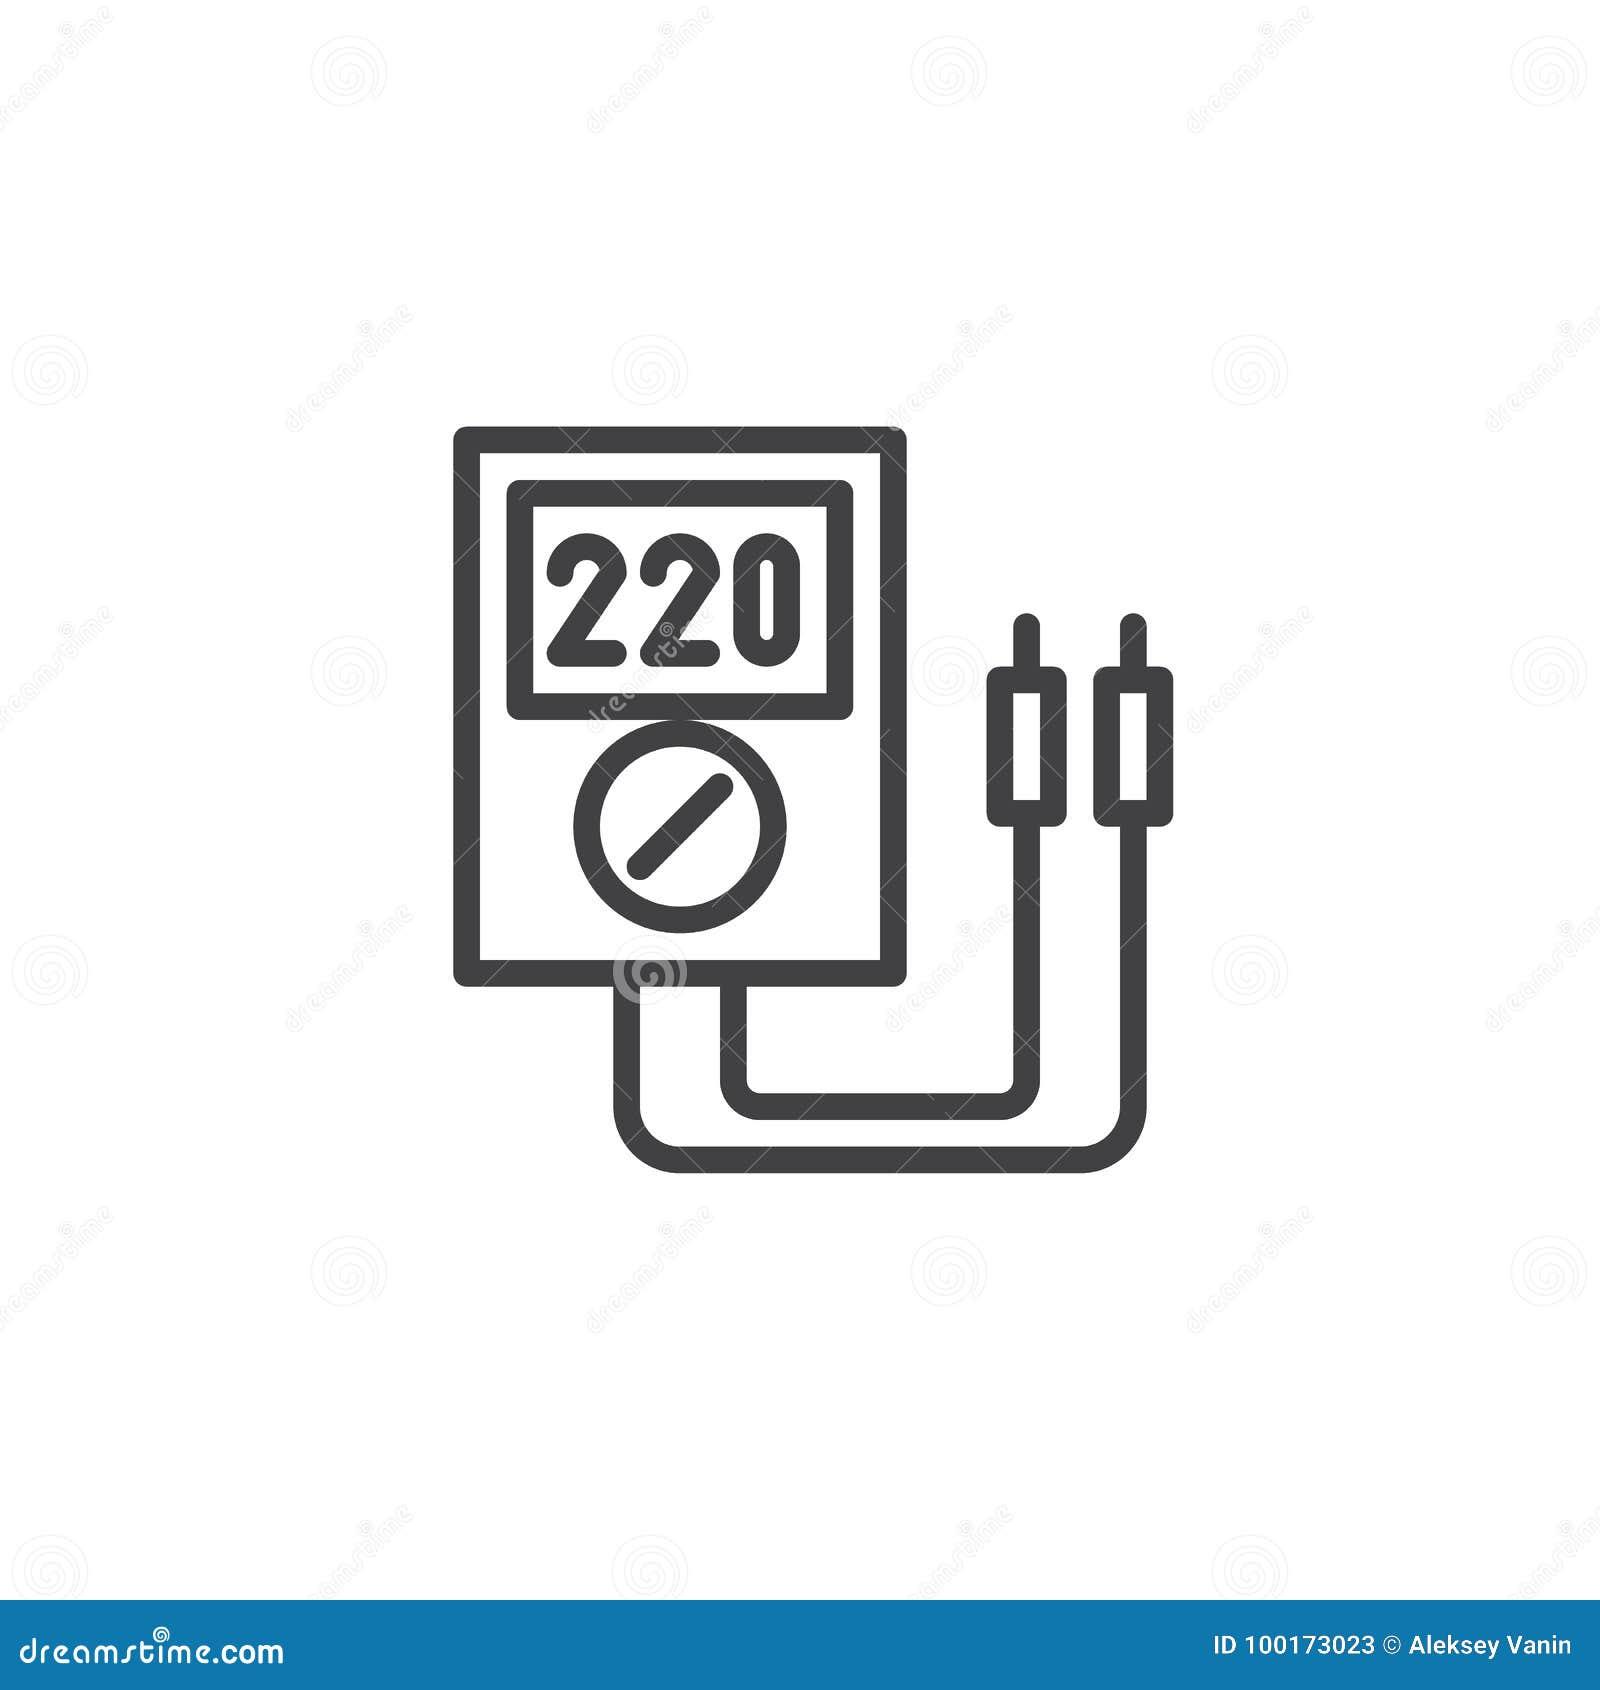 Voltmeter line icon stock vector. Illustration of stroke - 100173023